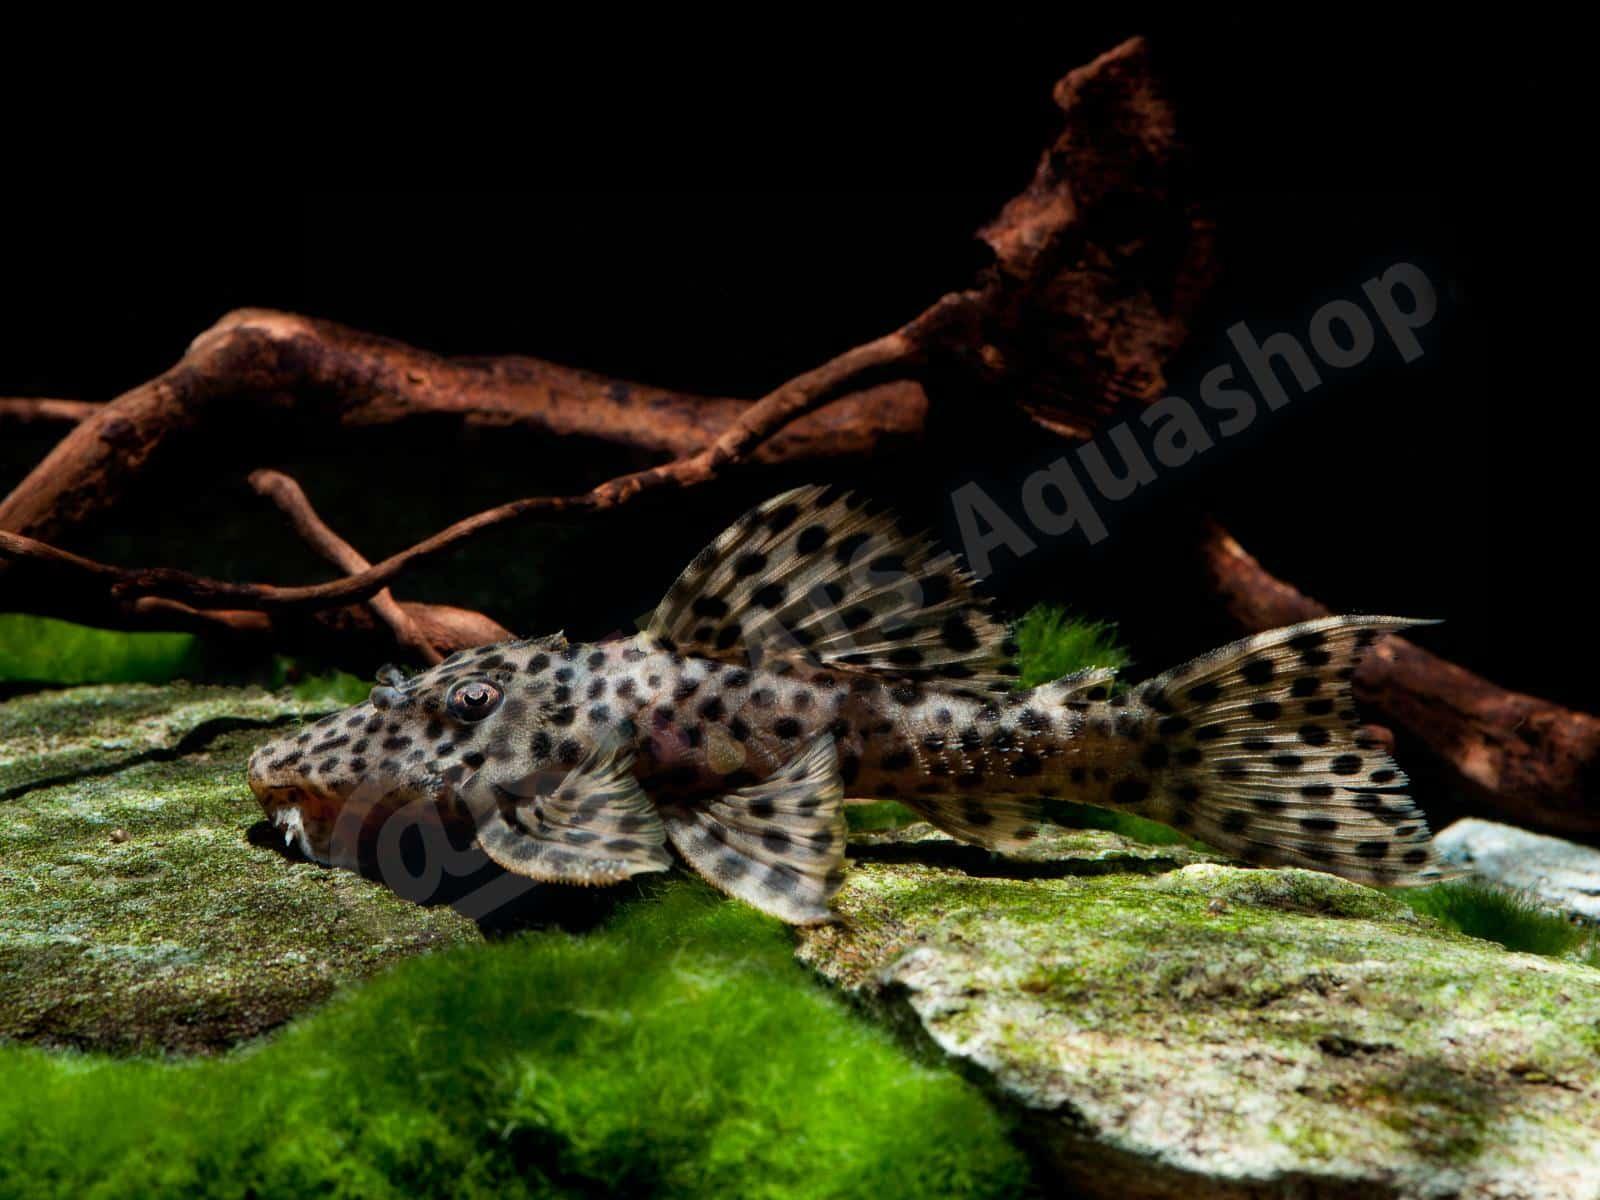 leporacanthicus heterodon enrico richter 0183 6